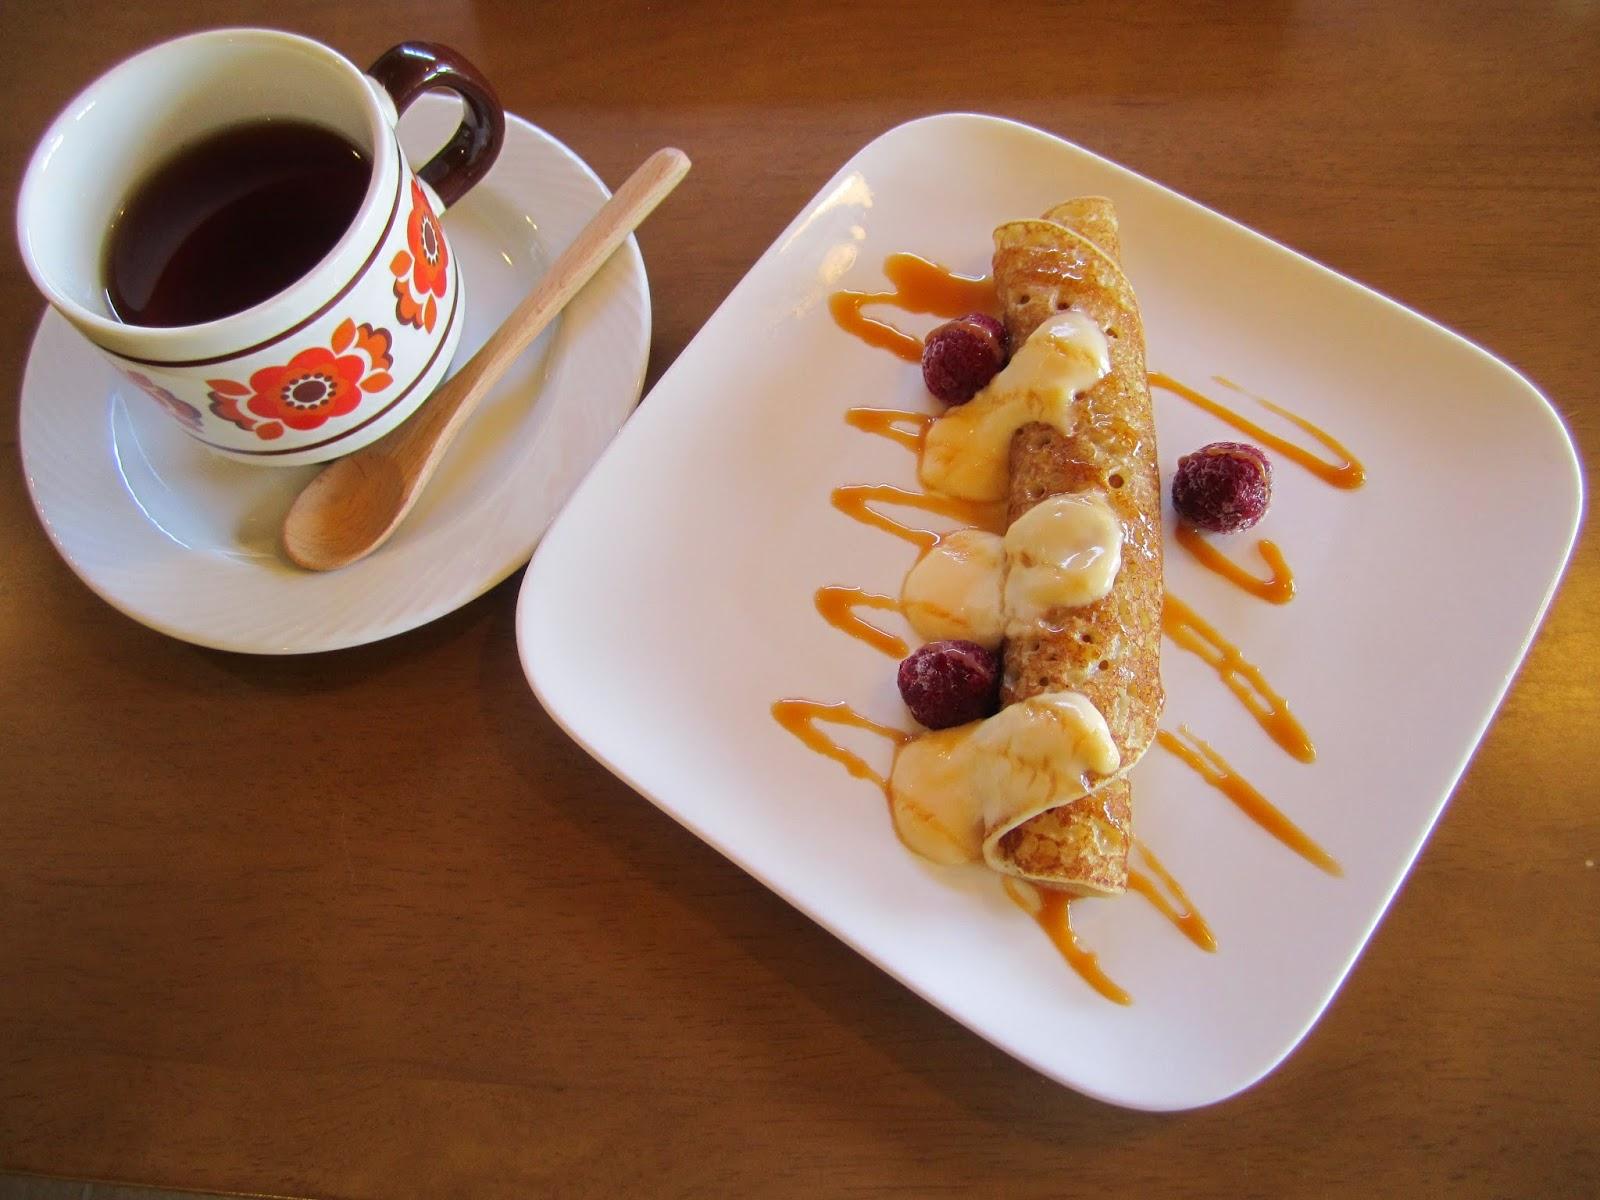 Daily Lunch Set Towada Bunny Rabbit Cafe Usa Cafe Lovelies 日替わりランチセット十和田うさぎカフェ うさカフェラヴリーズ